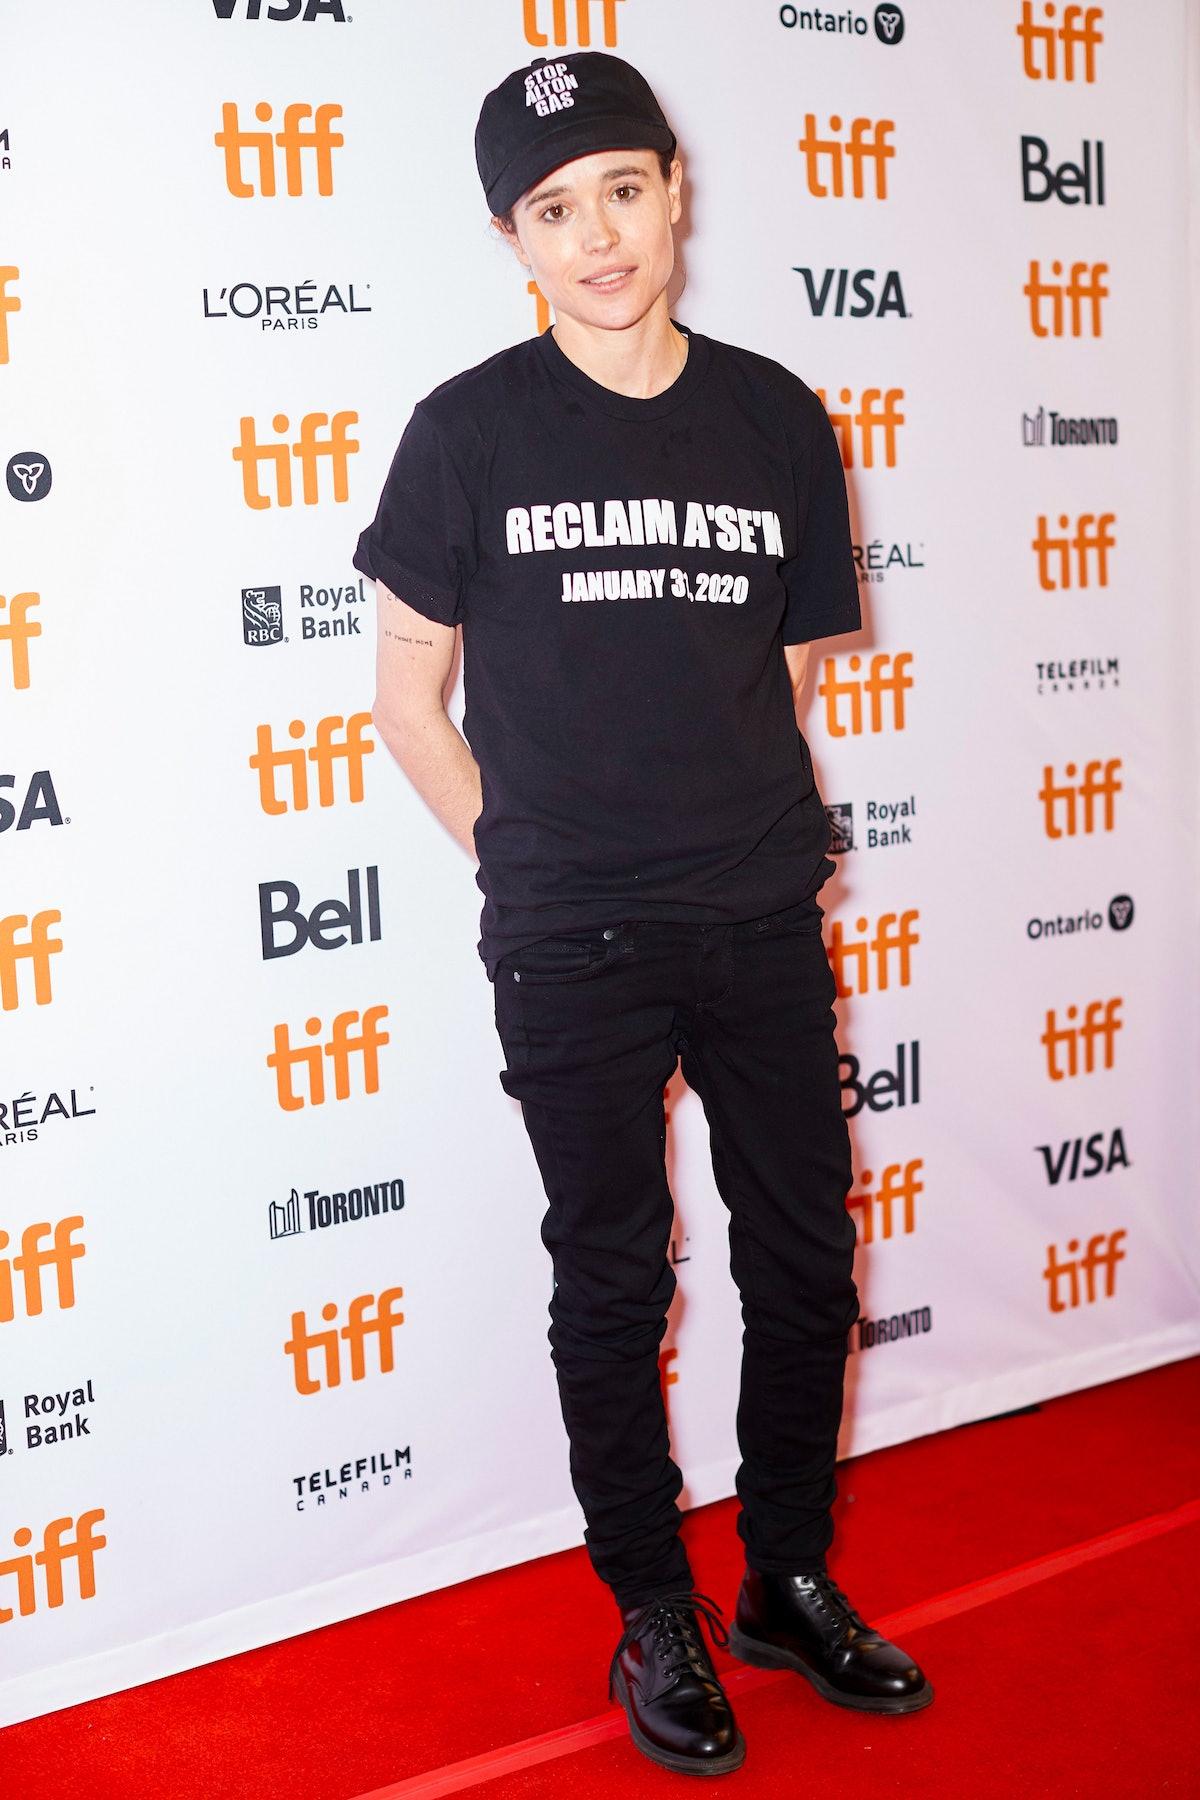 Actor Elliot Page